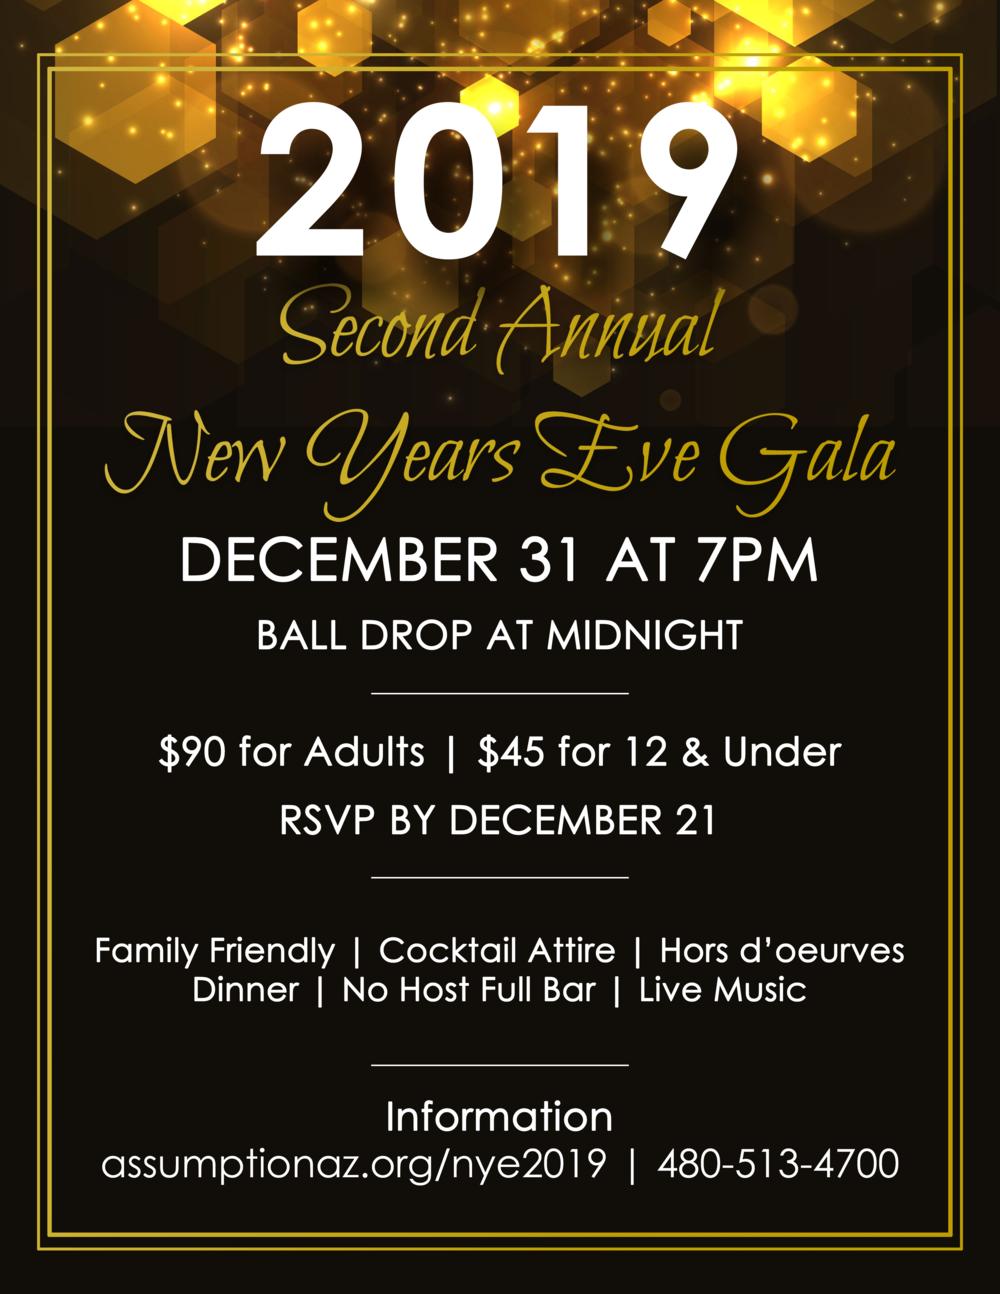 NYE 2019 Flyer.png